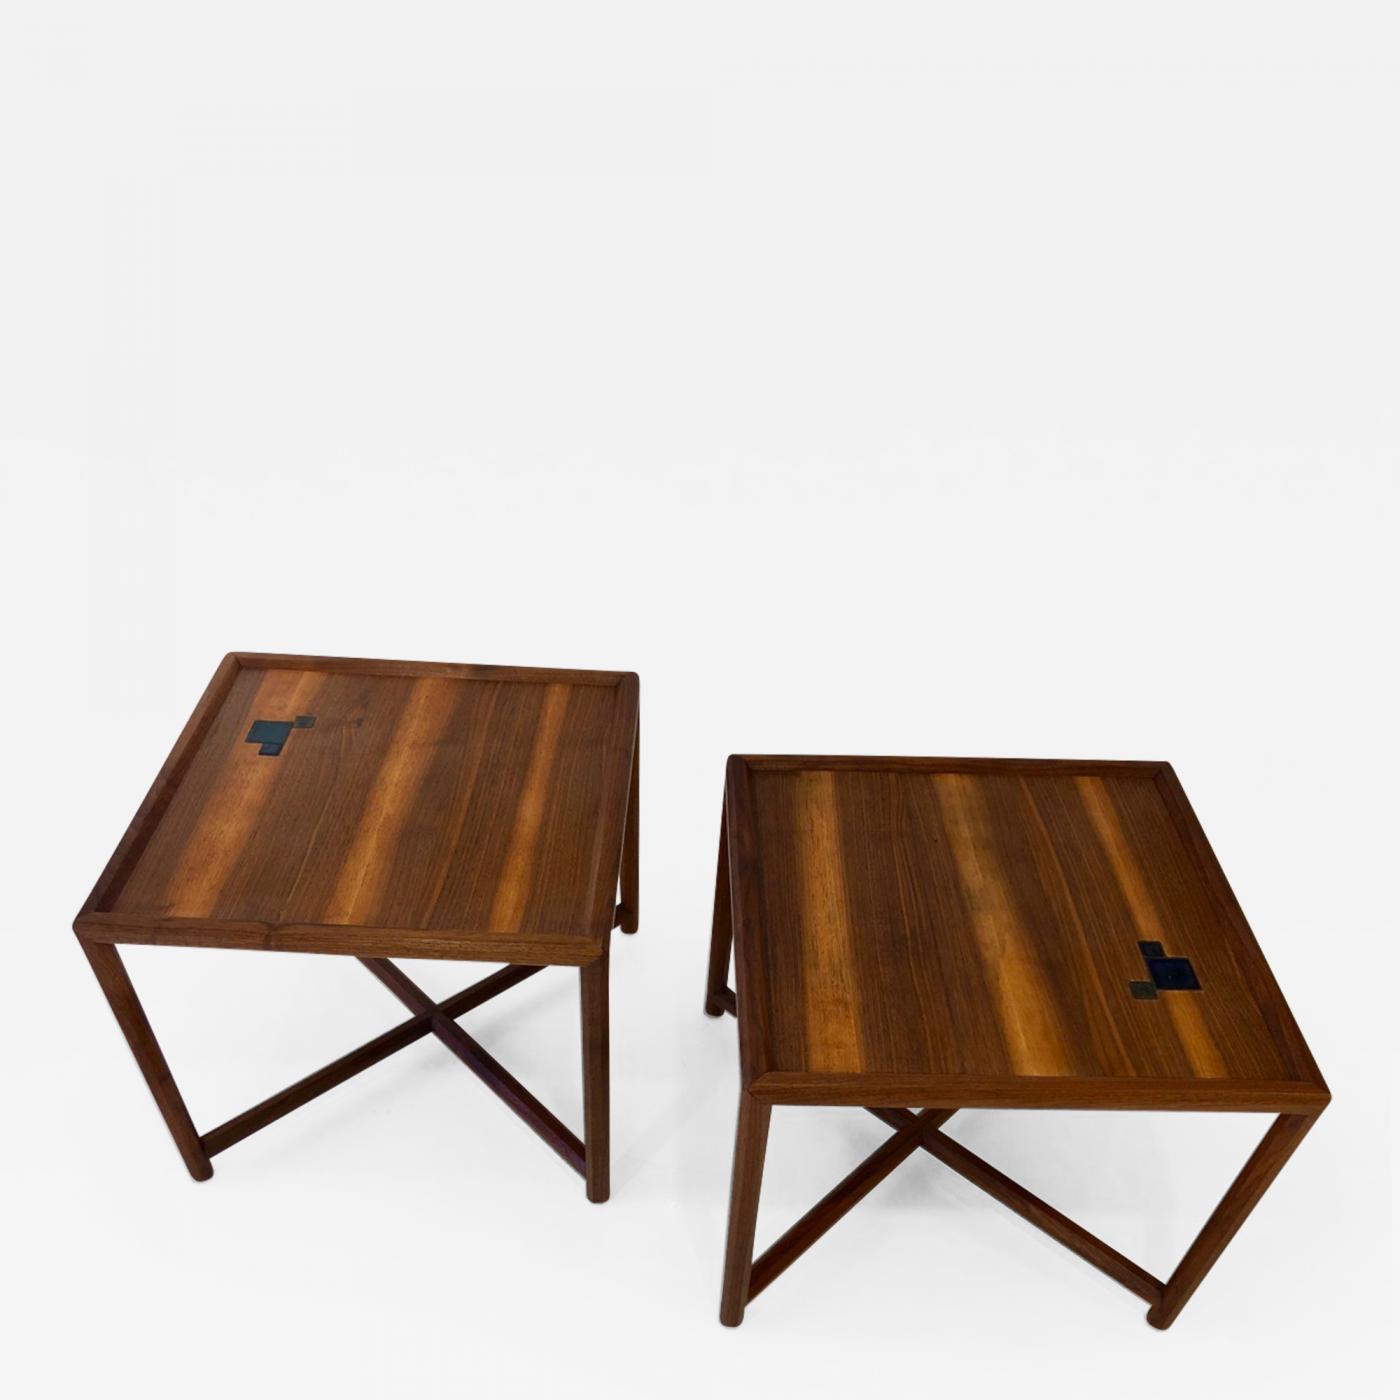 9b144452c05a Edward Wormley - Pair of Dunbar Janus End Tables with Tiffany Tiles